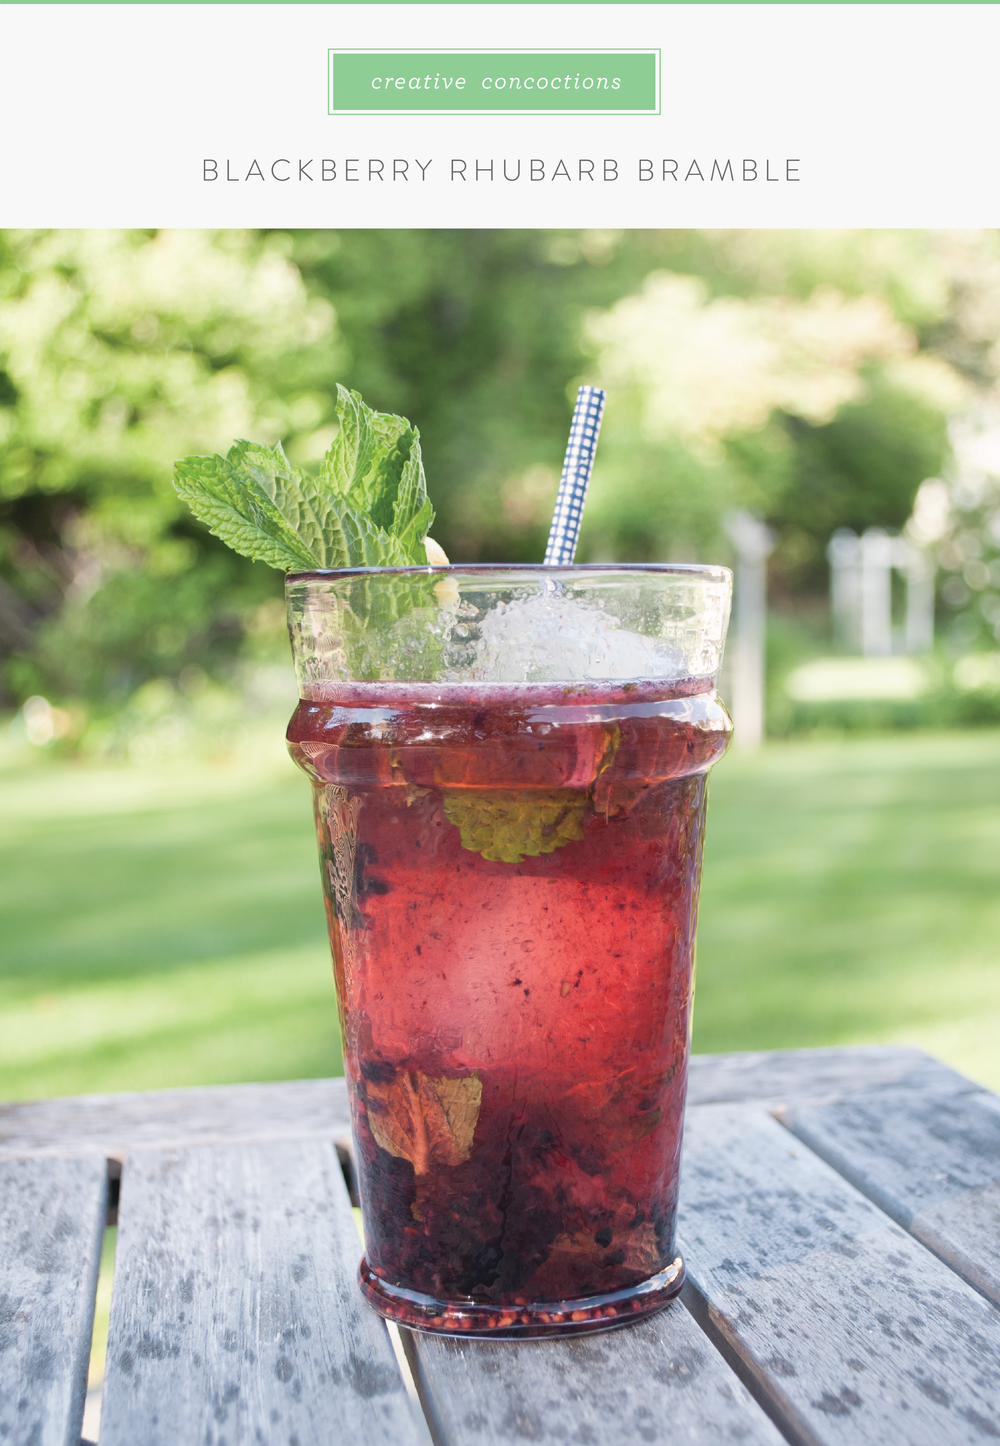 Blackberry Rhubarb Bramble Cocktail